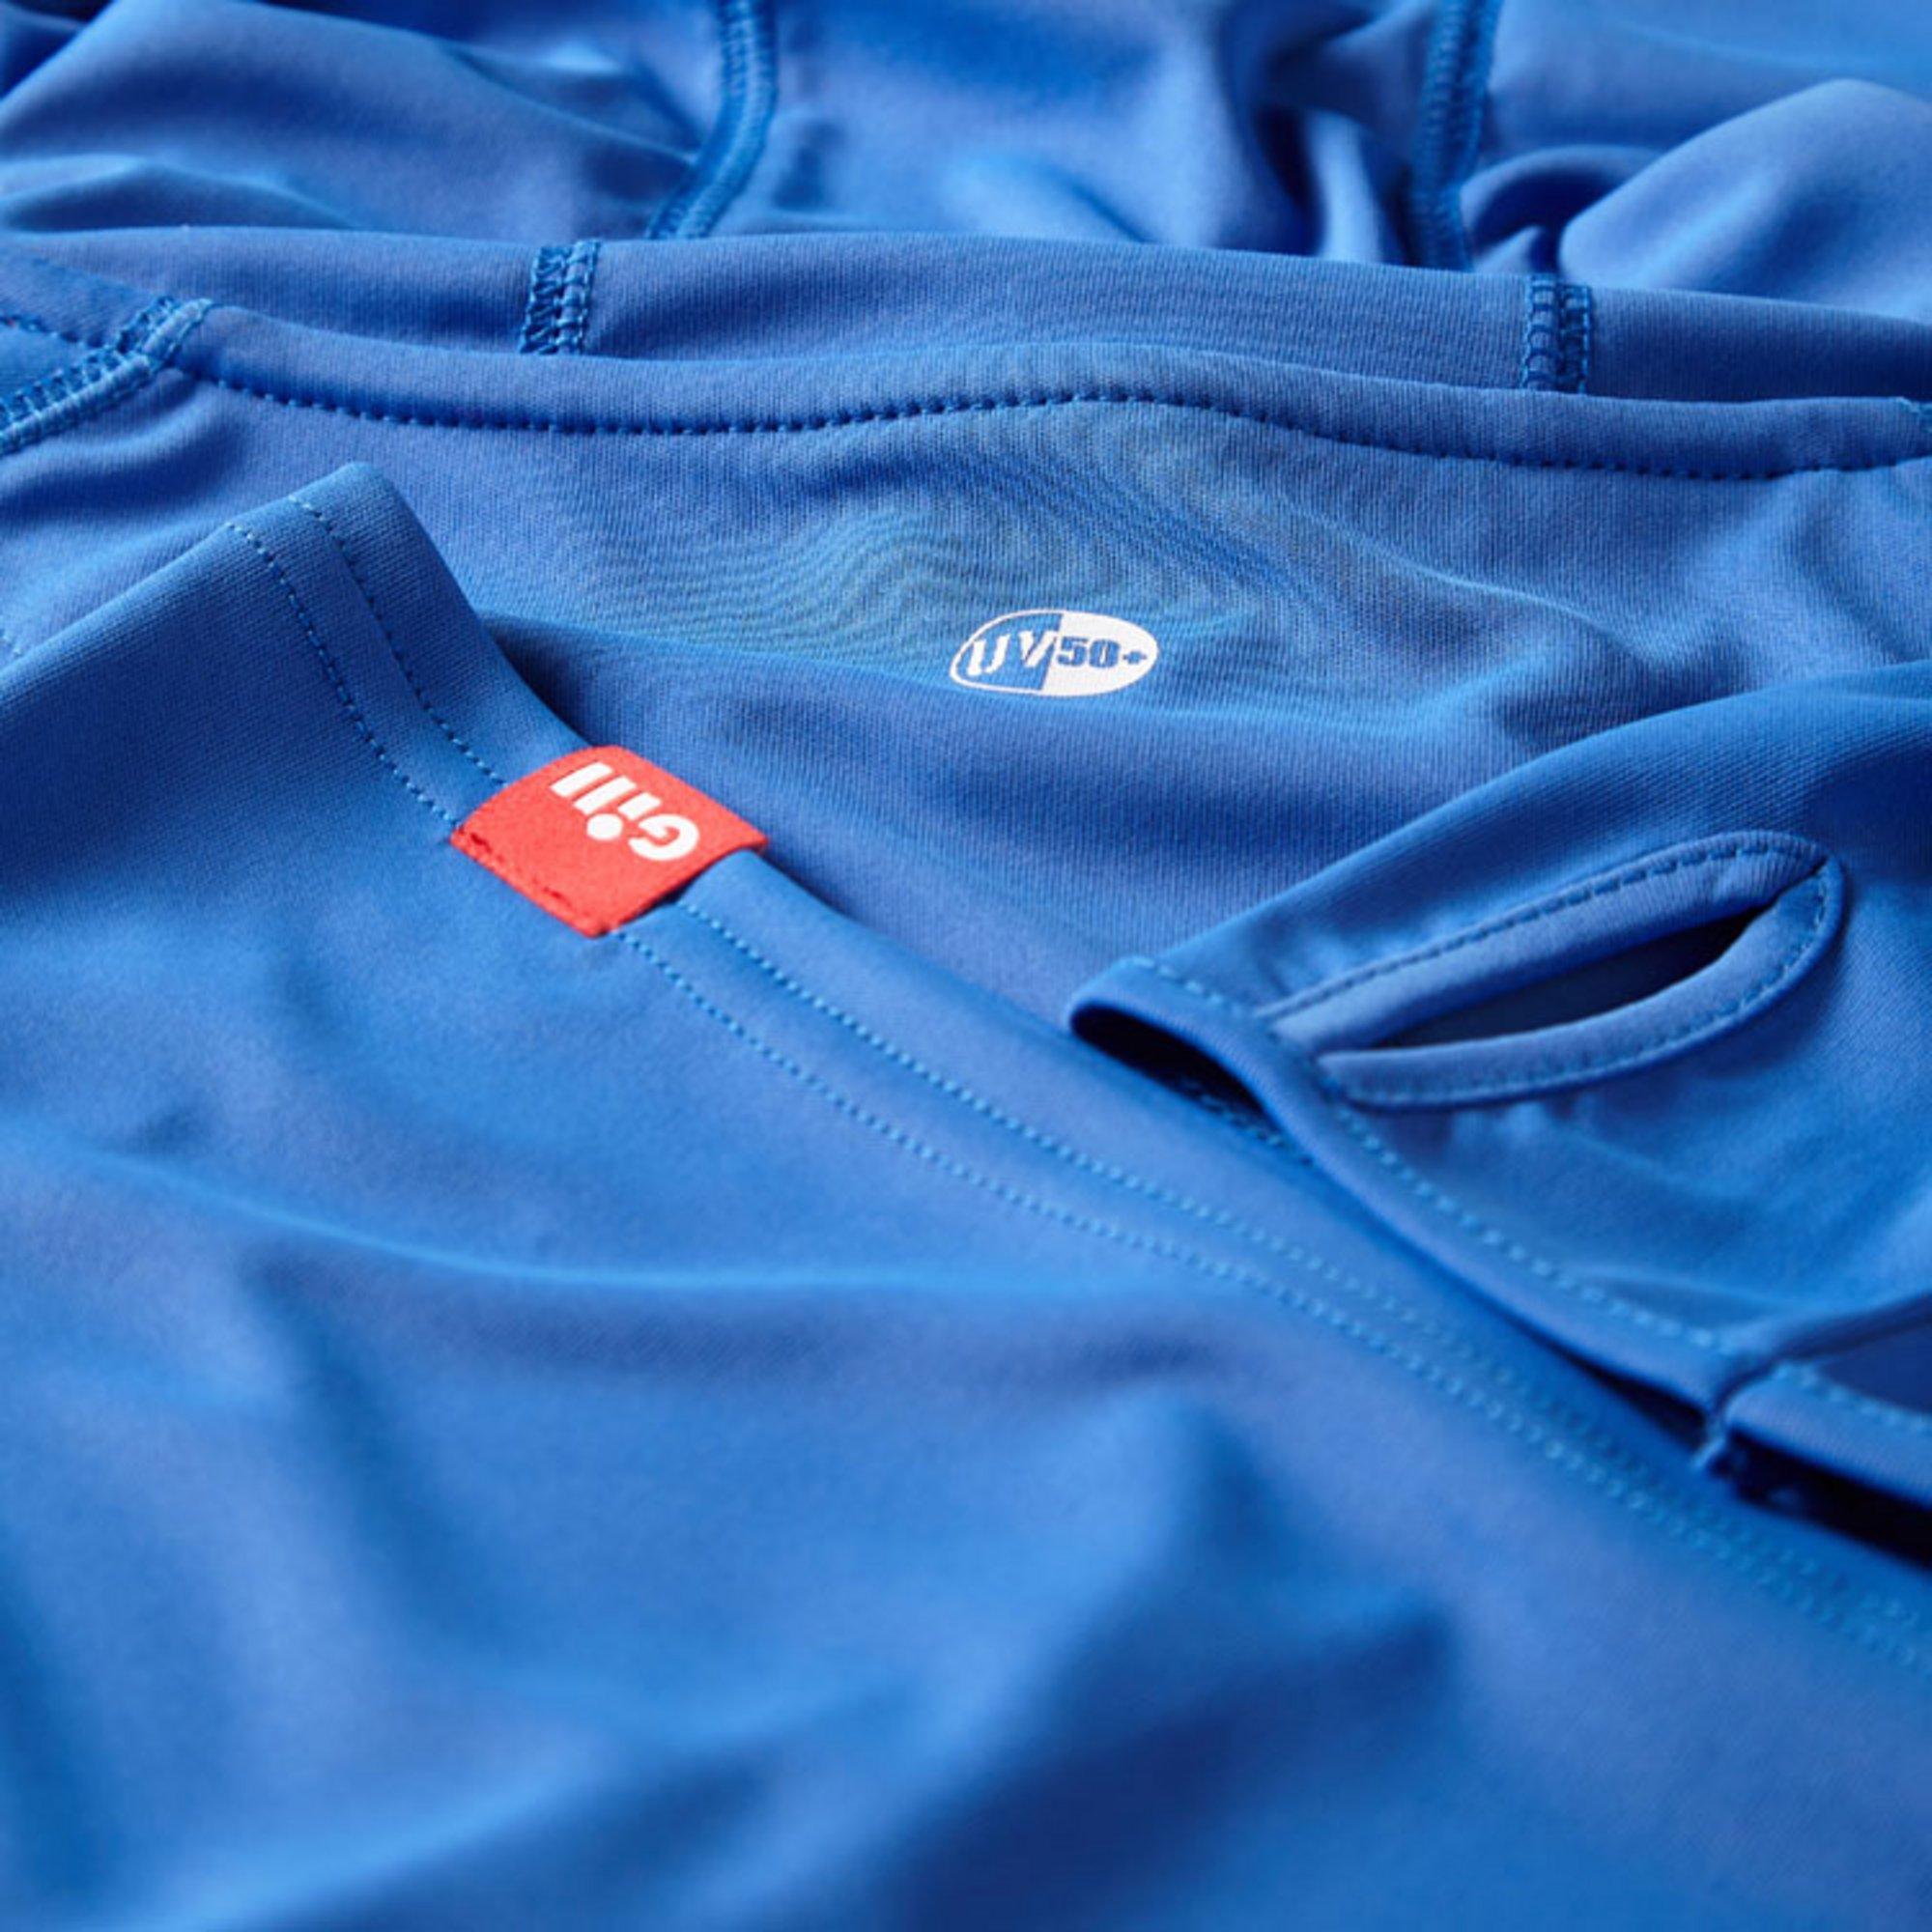 UV Tec Hoody - UV016-BLU01-4.jpg